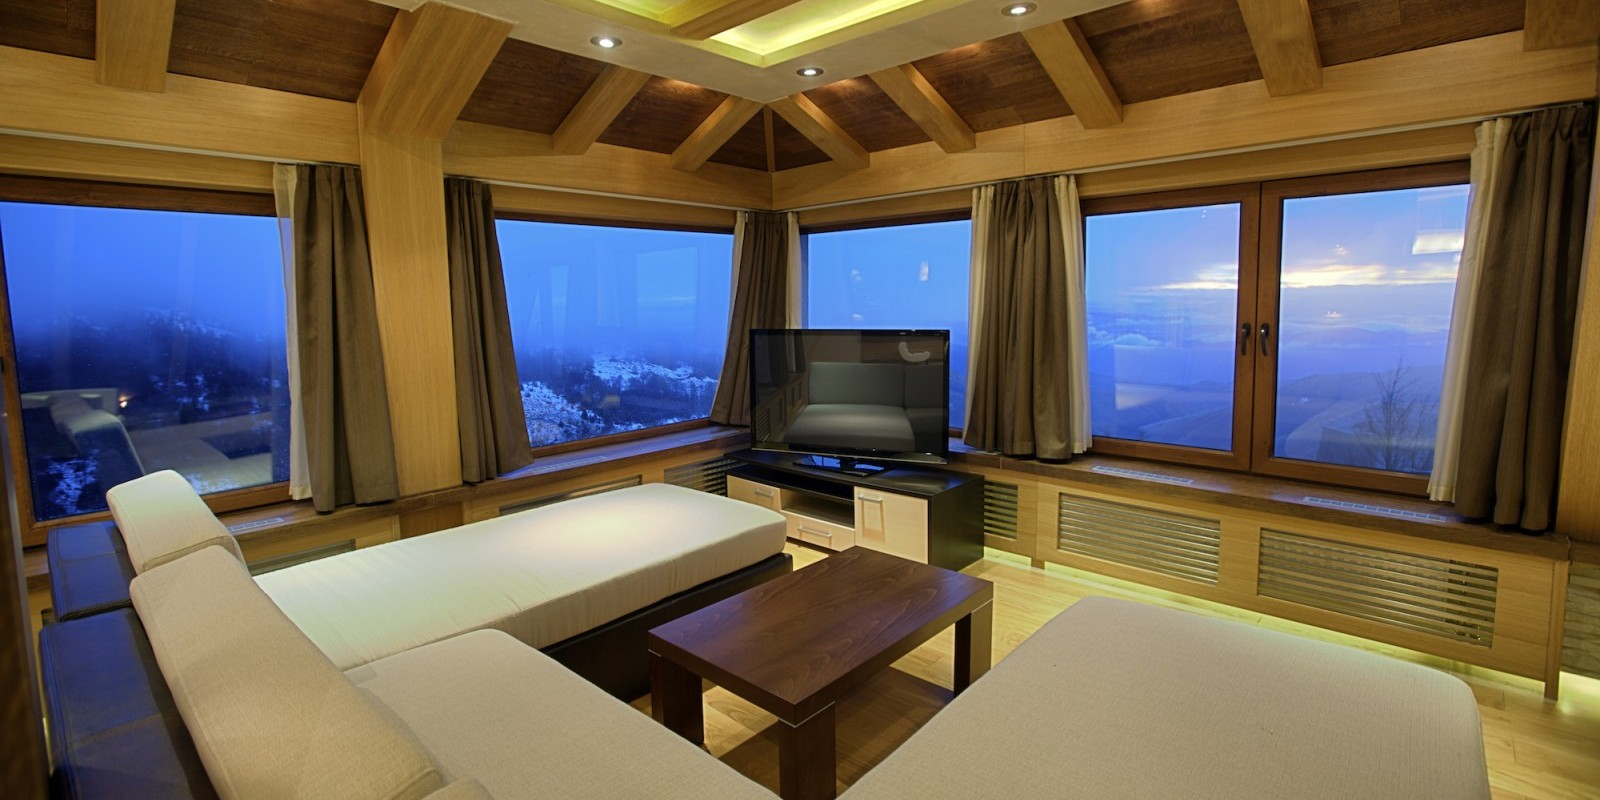 Family Room in Winter